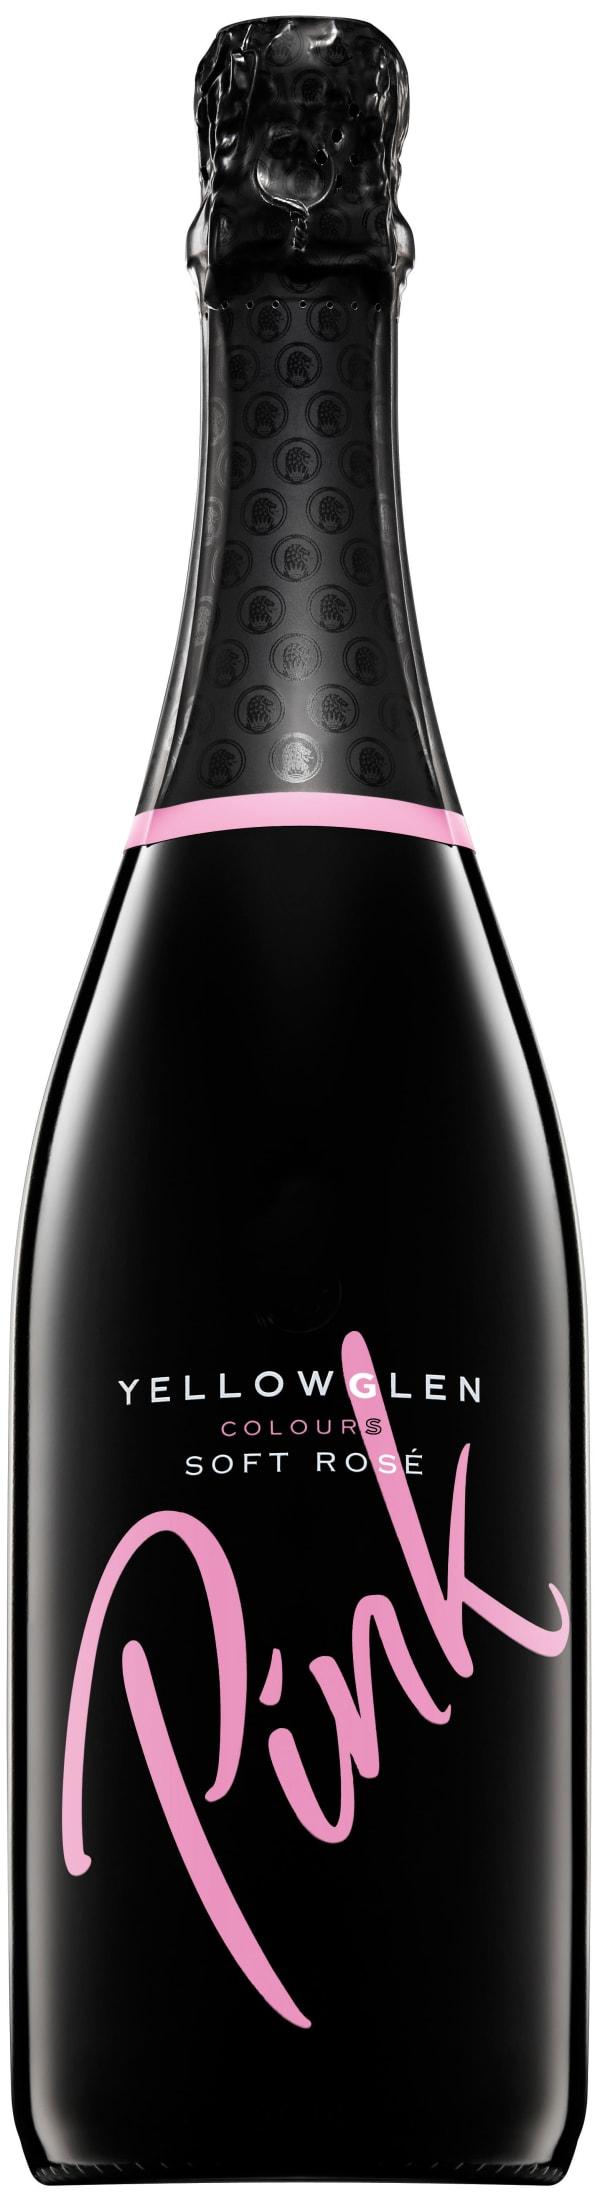 Yellowglen Pink Dry